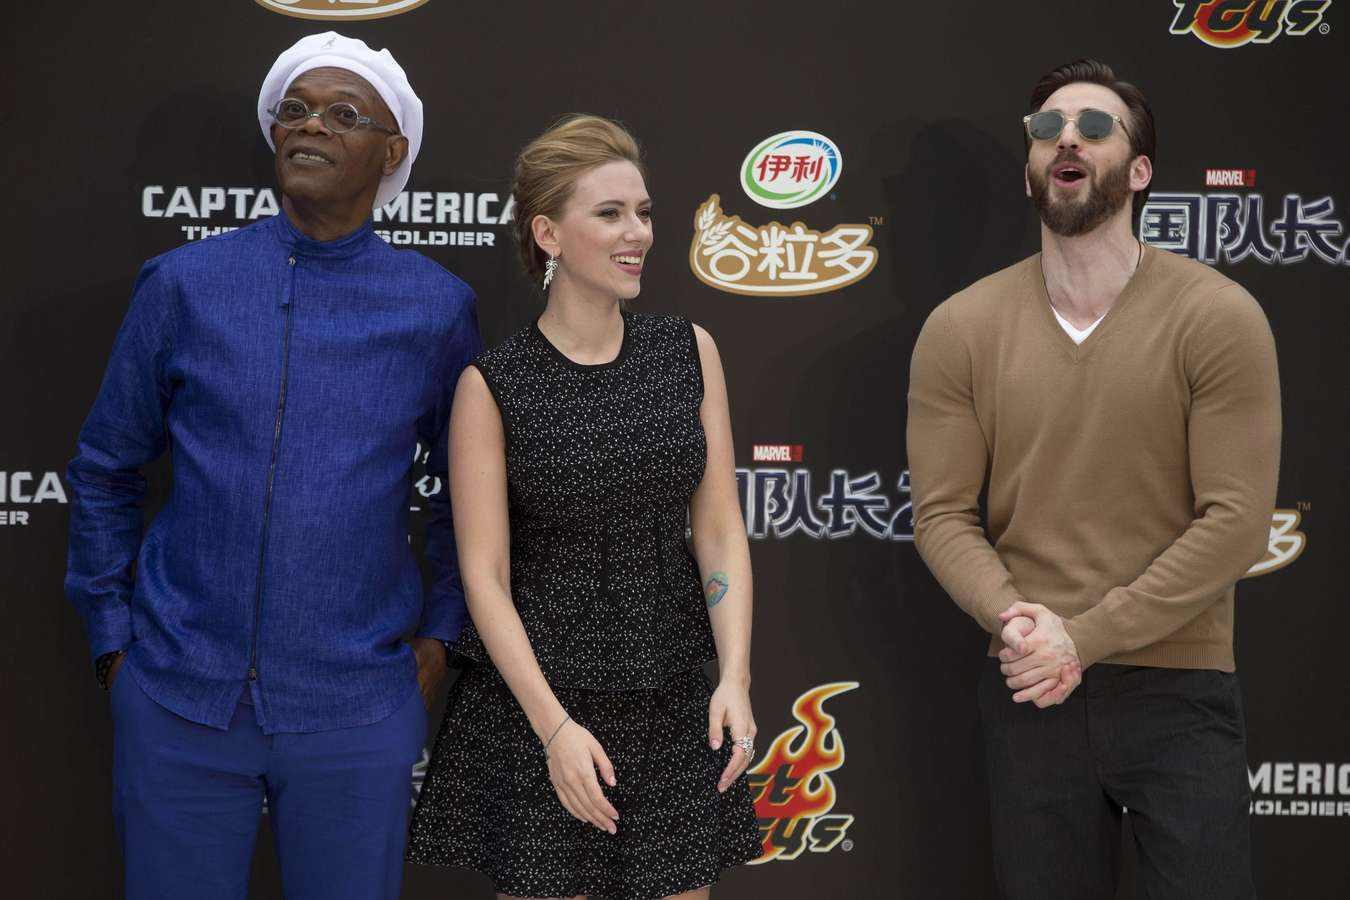 Scarlett Johansson 2014 : Scarlett Johansson: Captain America: The Winter Soldier premiere in Beijing -01